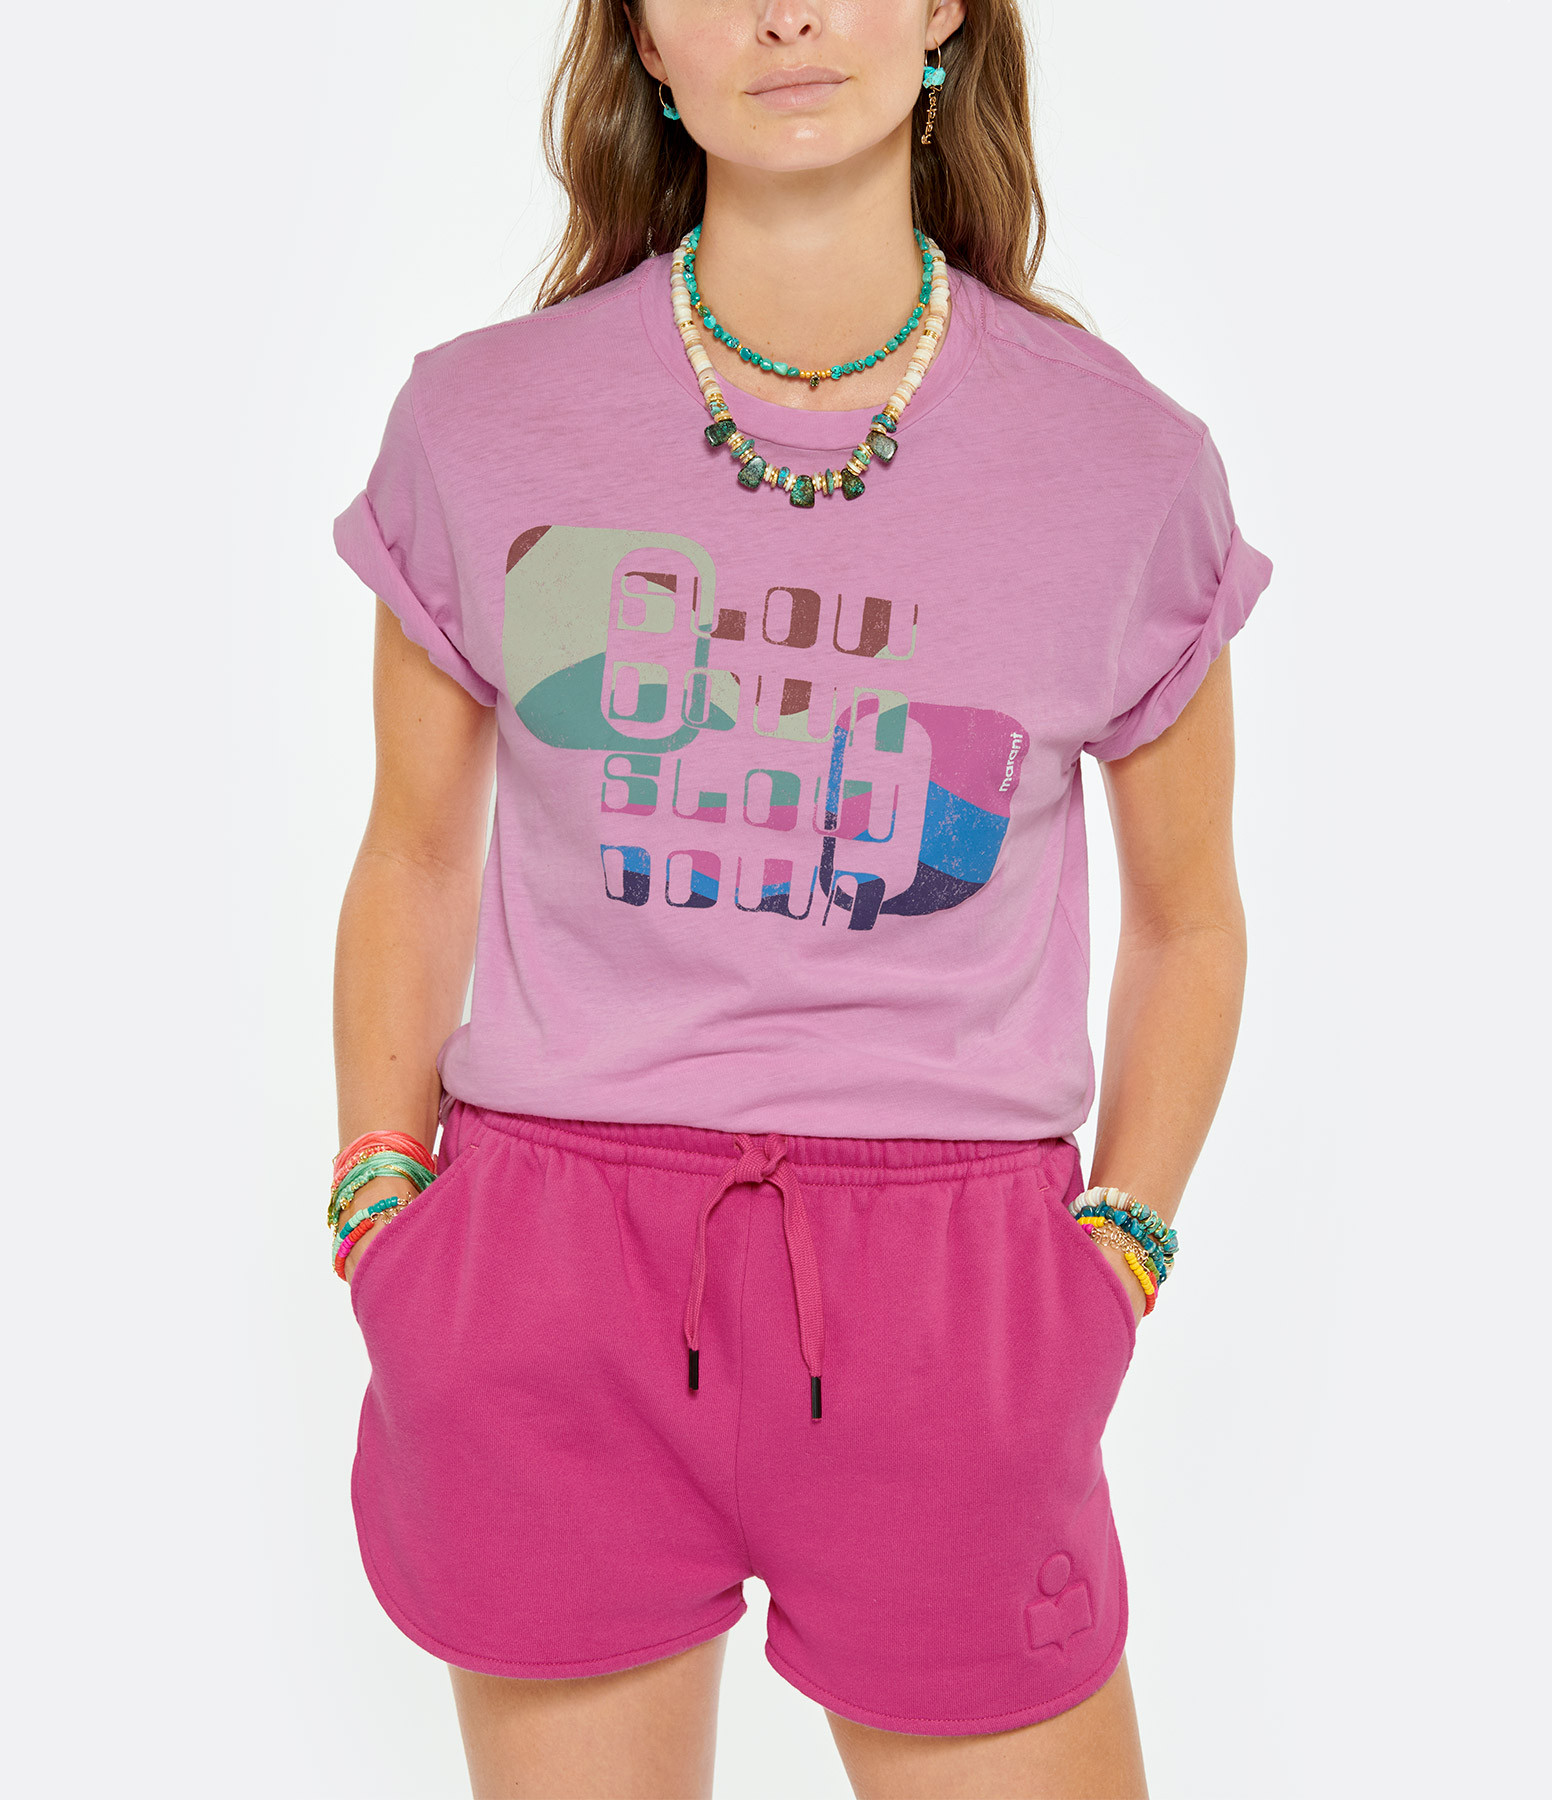 ISABEL MARANT ÉTOILE - Tee-shirt Zewel Coton Rose Néon